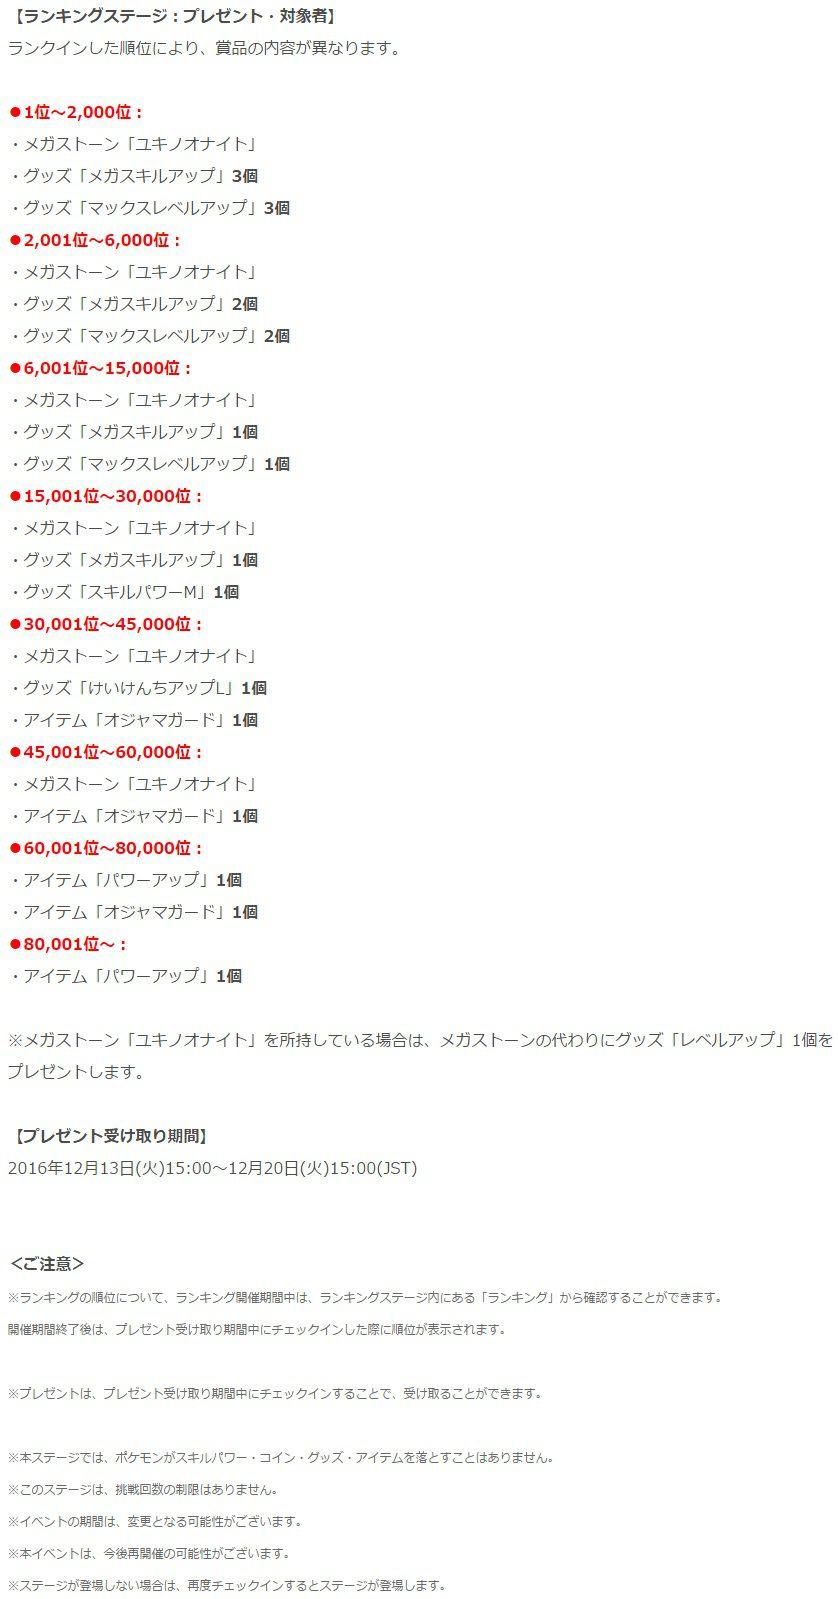 image_7428.jpg